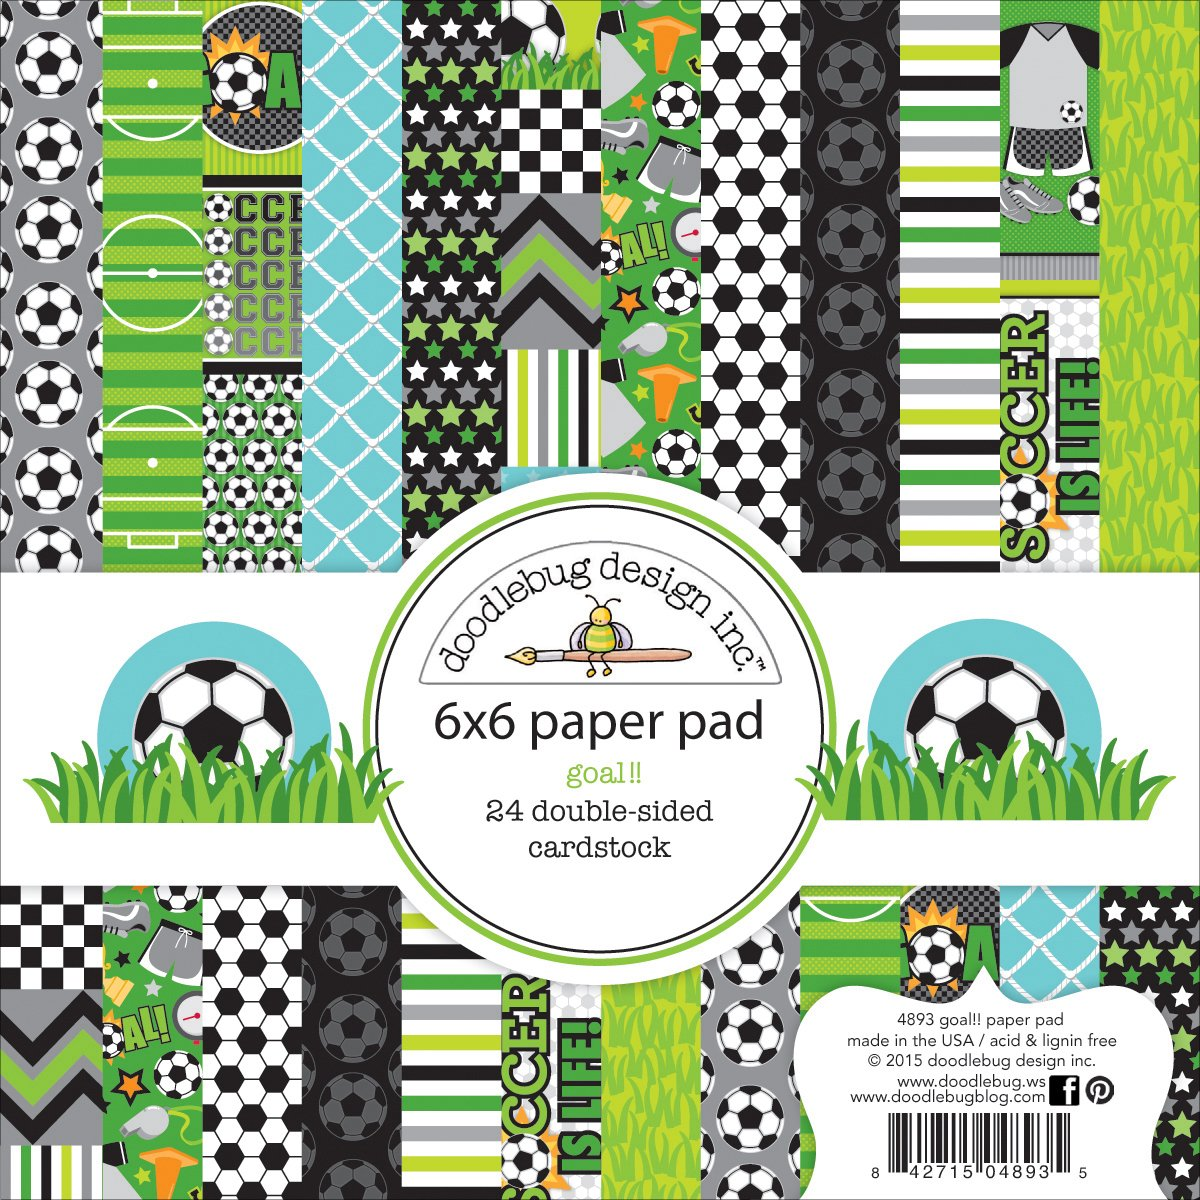 Doodlebug Double-Sided Paper Pad 6x6 24/Pkg-Goal!! by DOODLEBUG B0164PQA6M